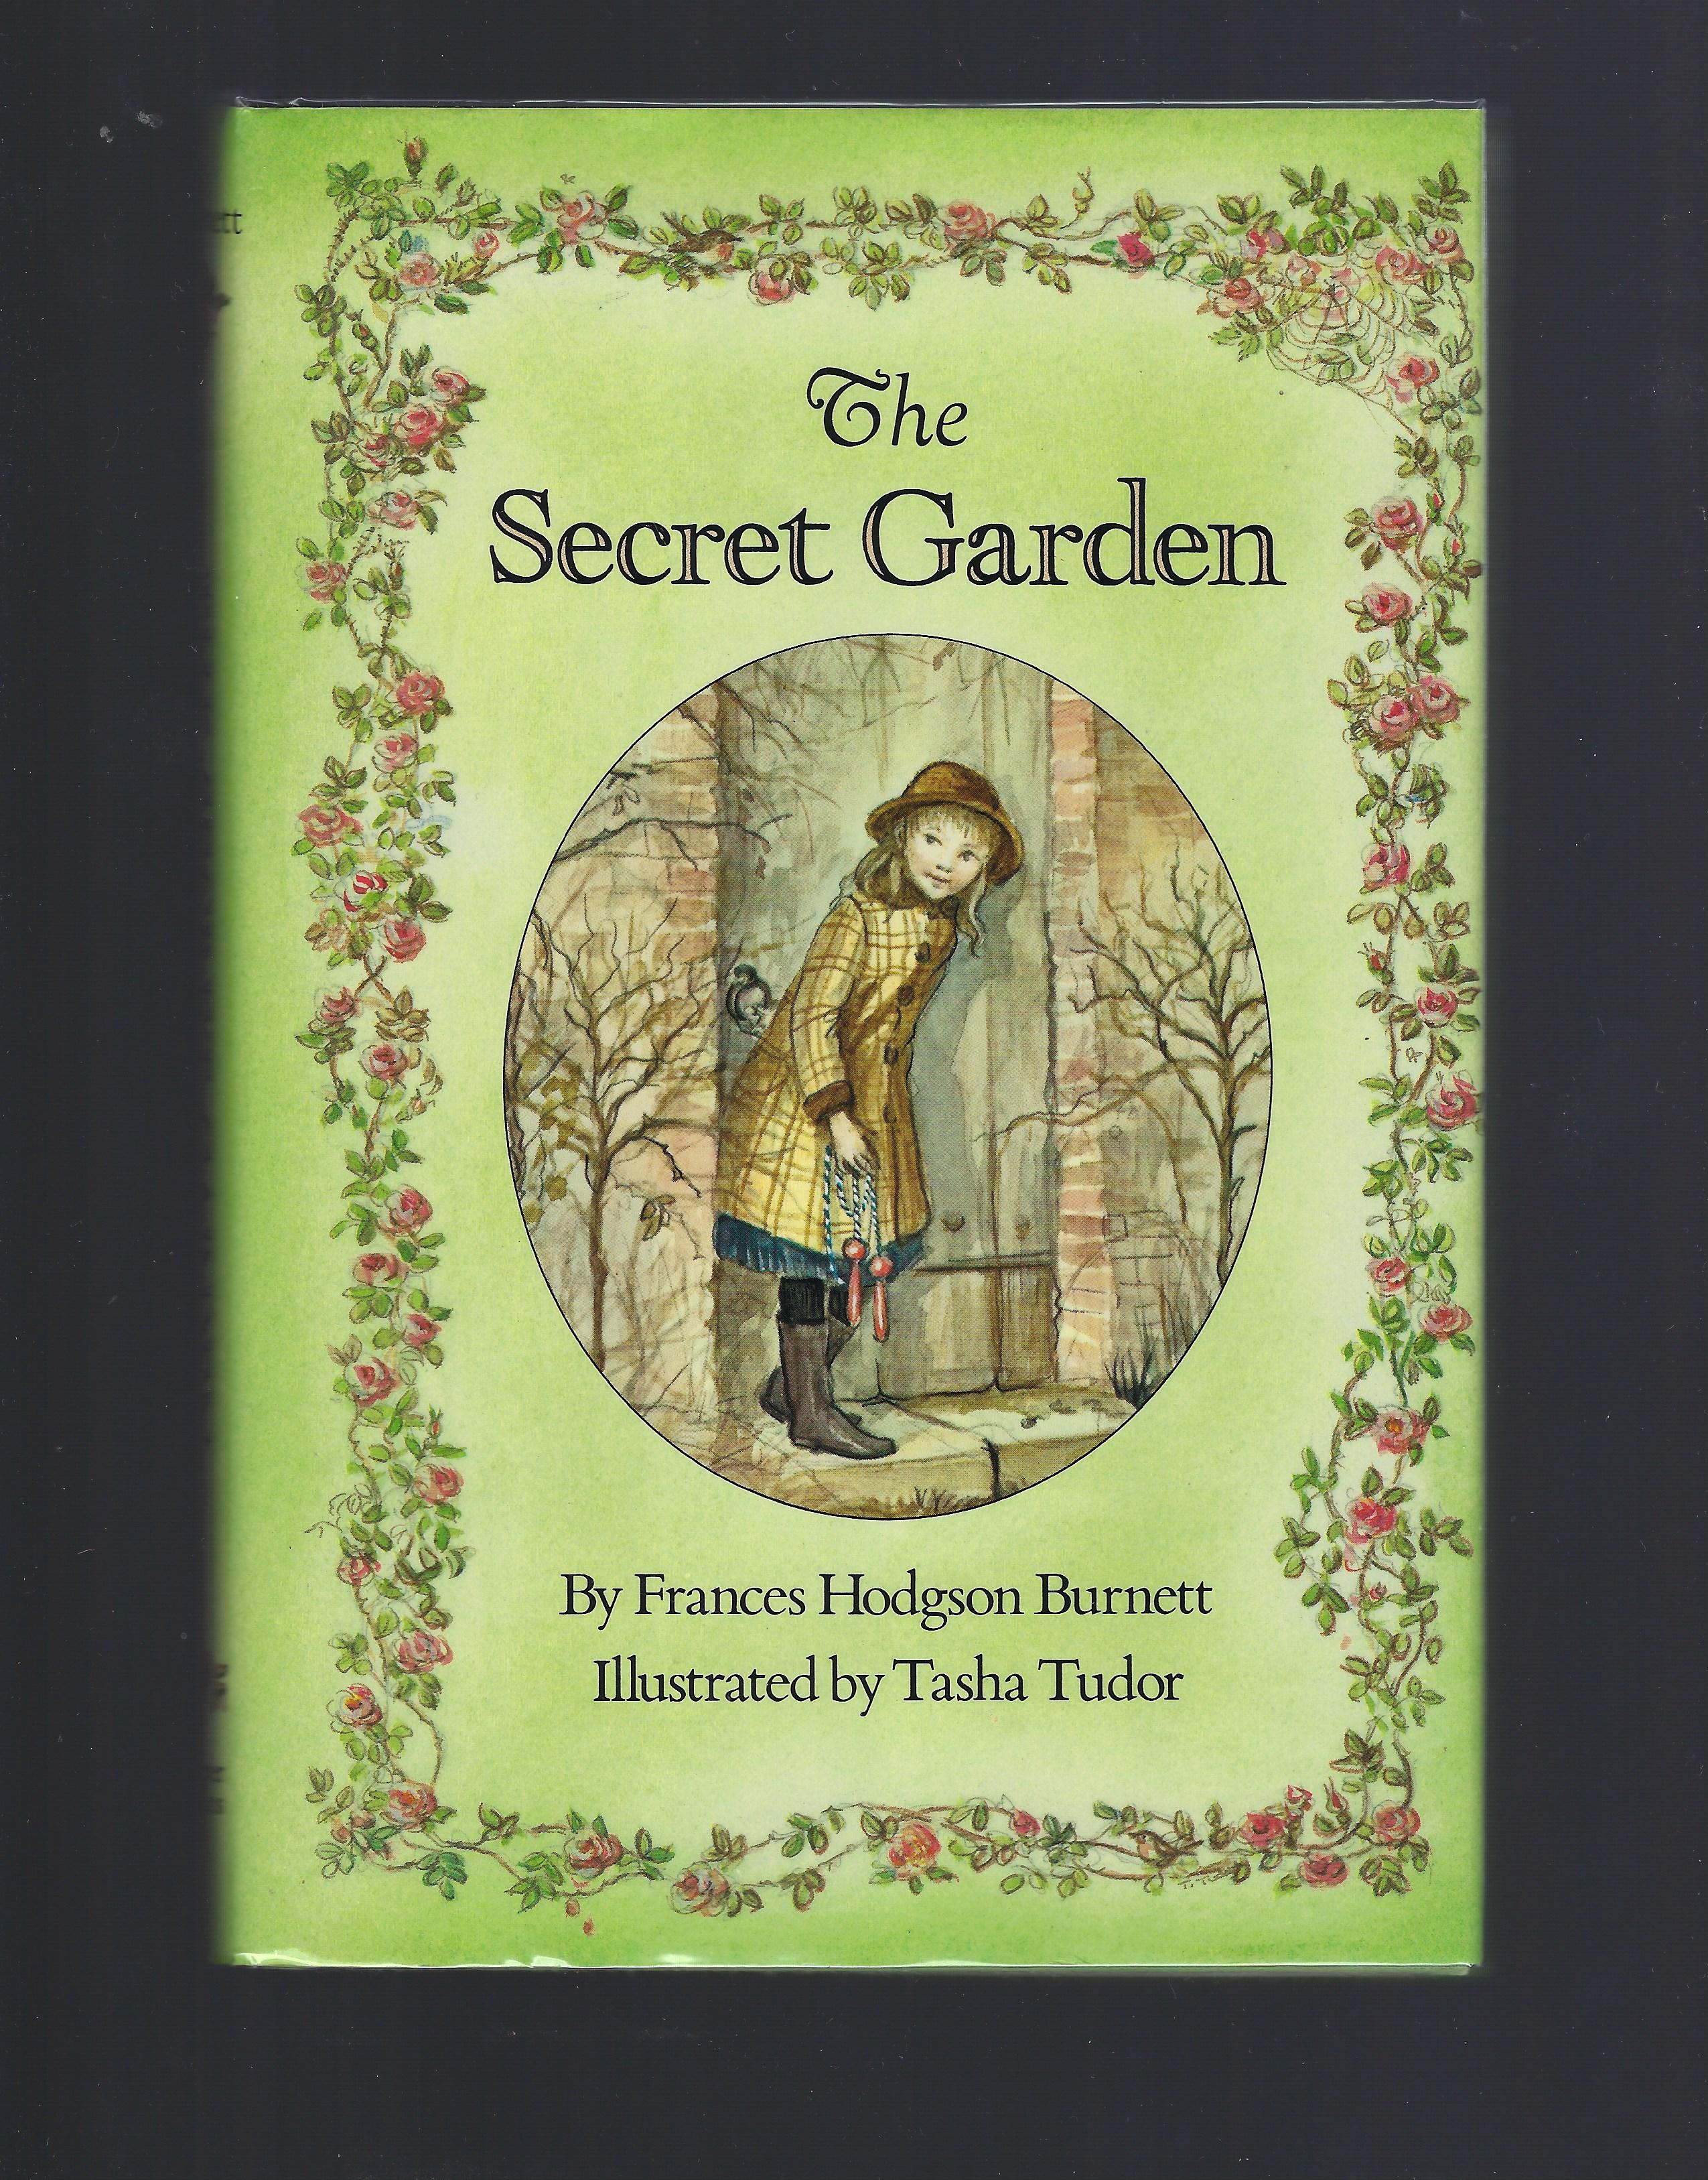 The Secret Garden Illustrated By Tasha Tudor HB/DJ, Frances Hodgson Burnett; Tudor, Tasha [Illustrator]